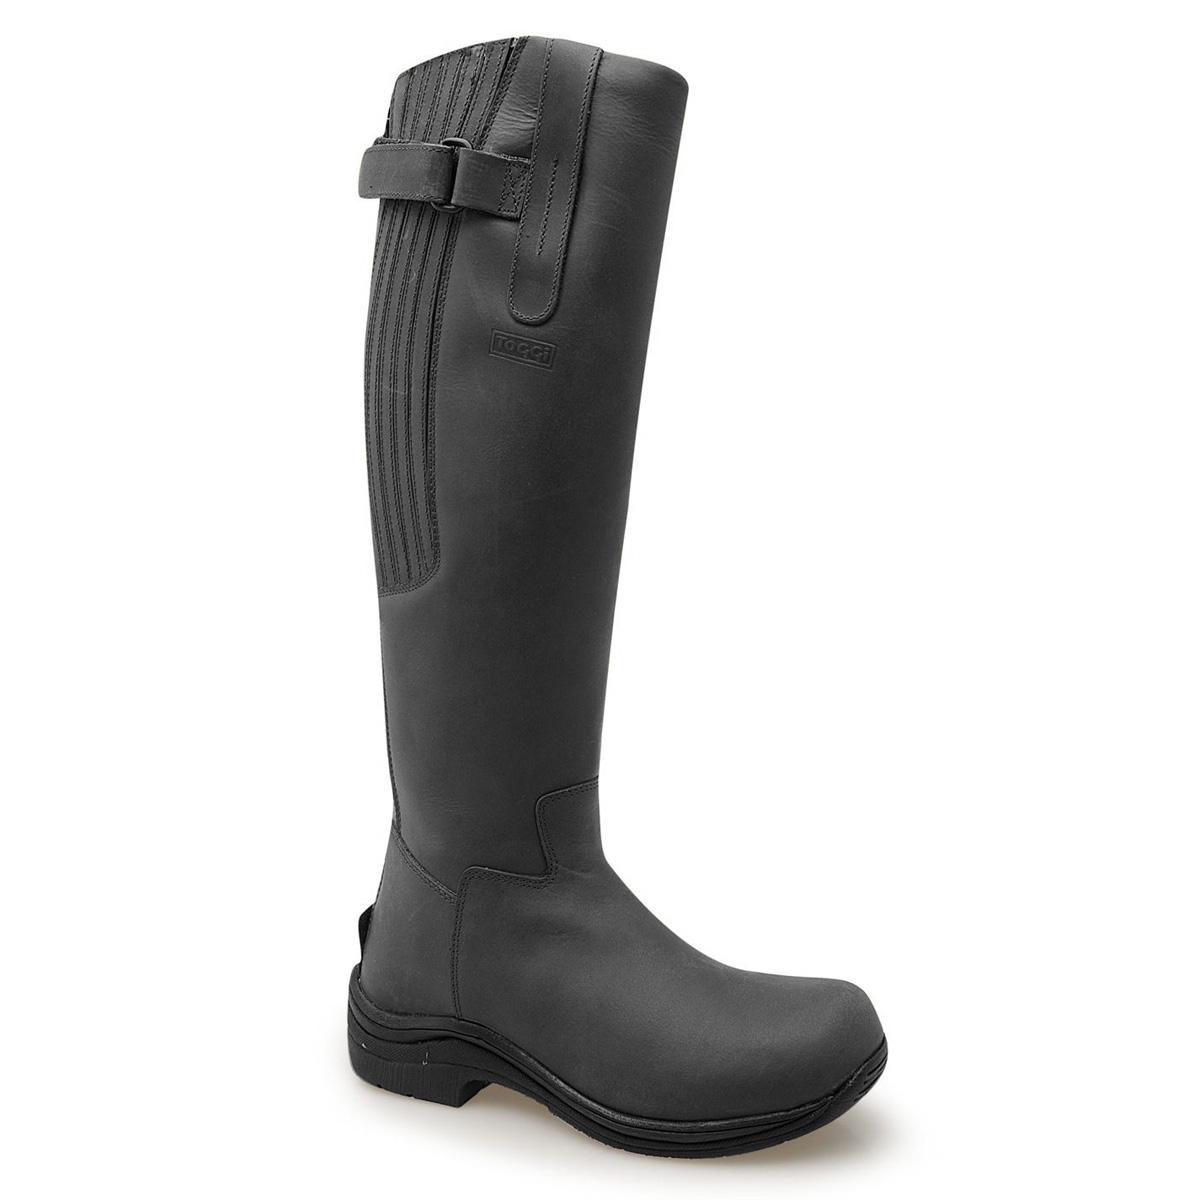 toggi boots image of toggi calgary riding boots (womens) - black ... xkaeeqy